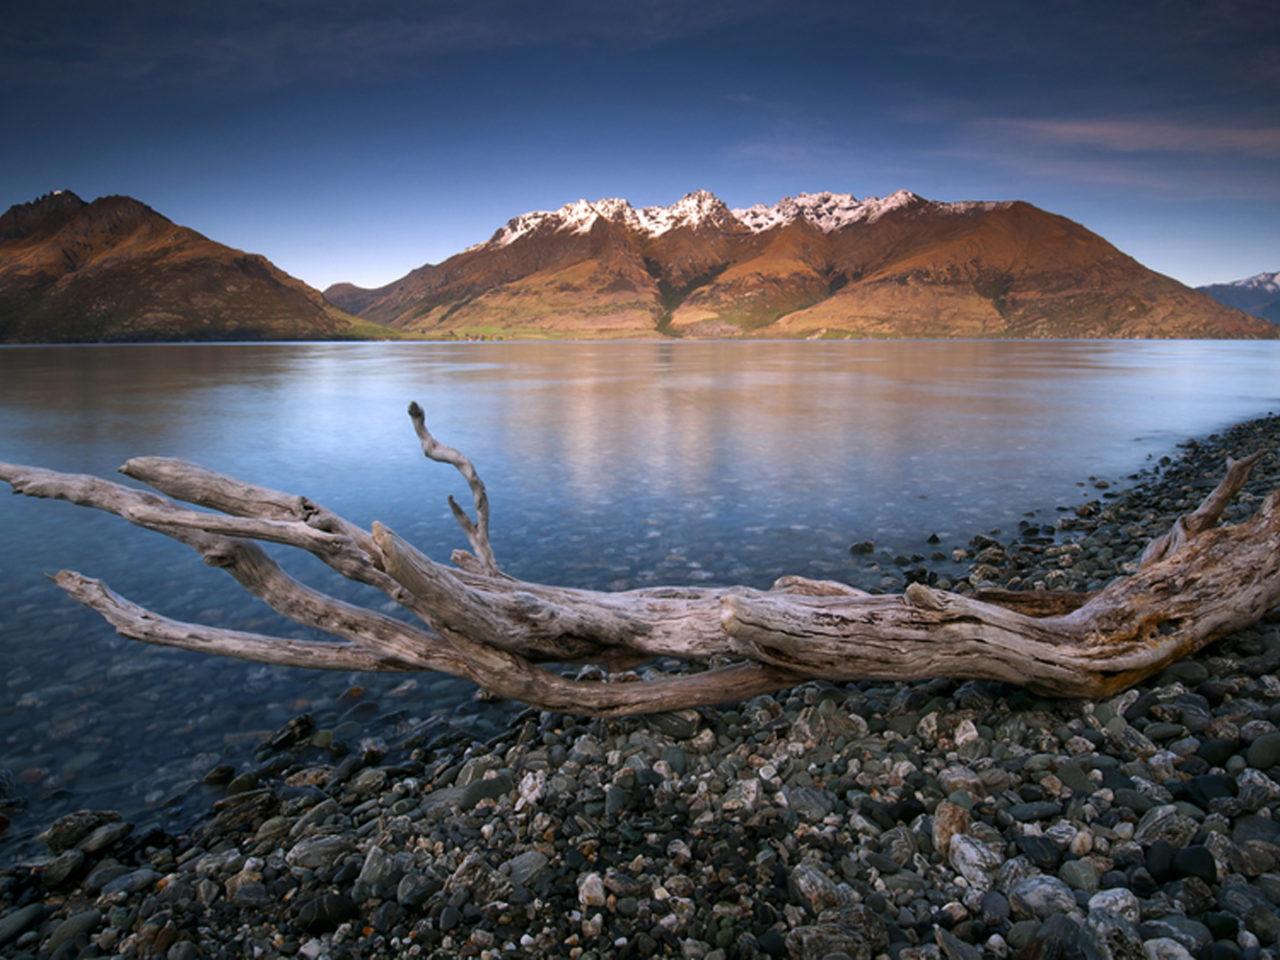 New Zealand Wallpaper Iphone X Lake Wakatipu Queenstown New Zealand Hd Wallpaper